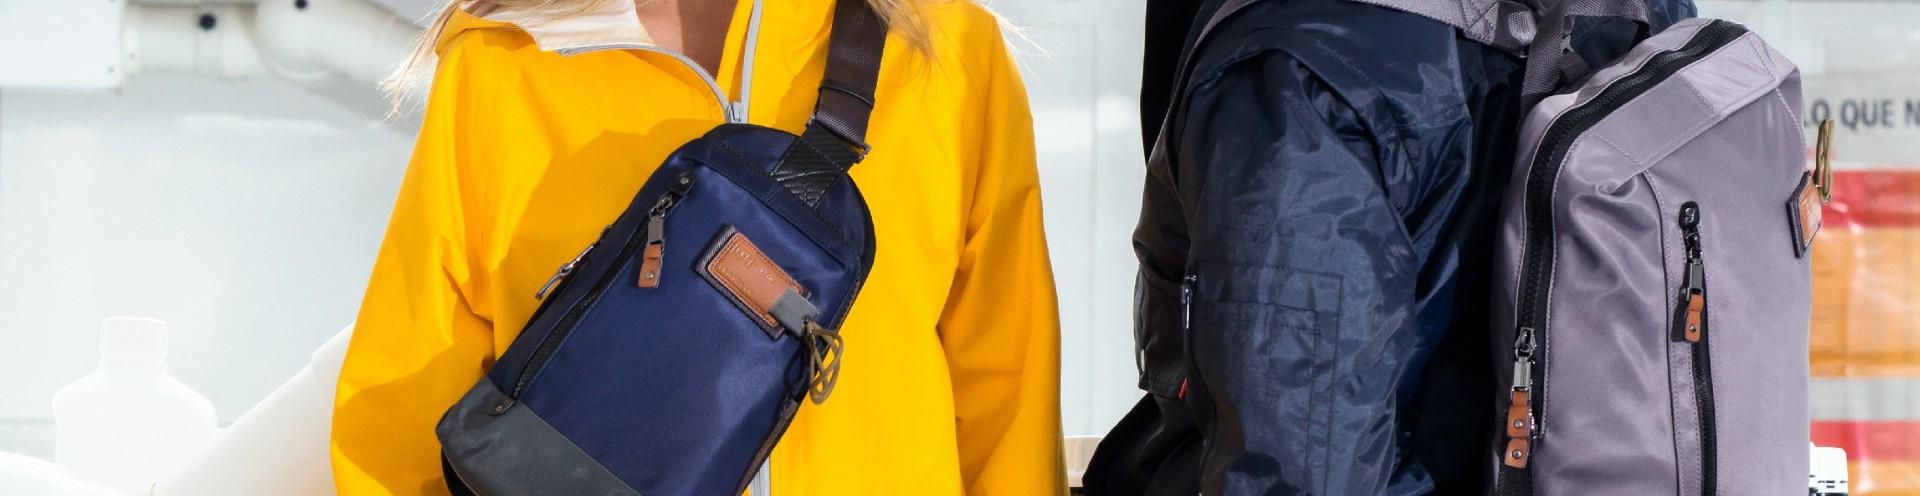 Women's Crossbody Bags for Tablet